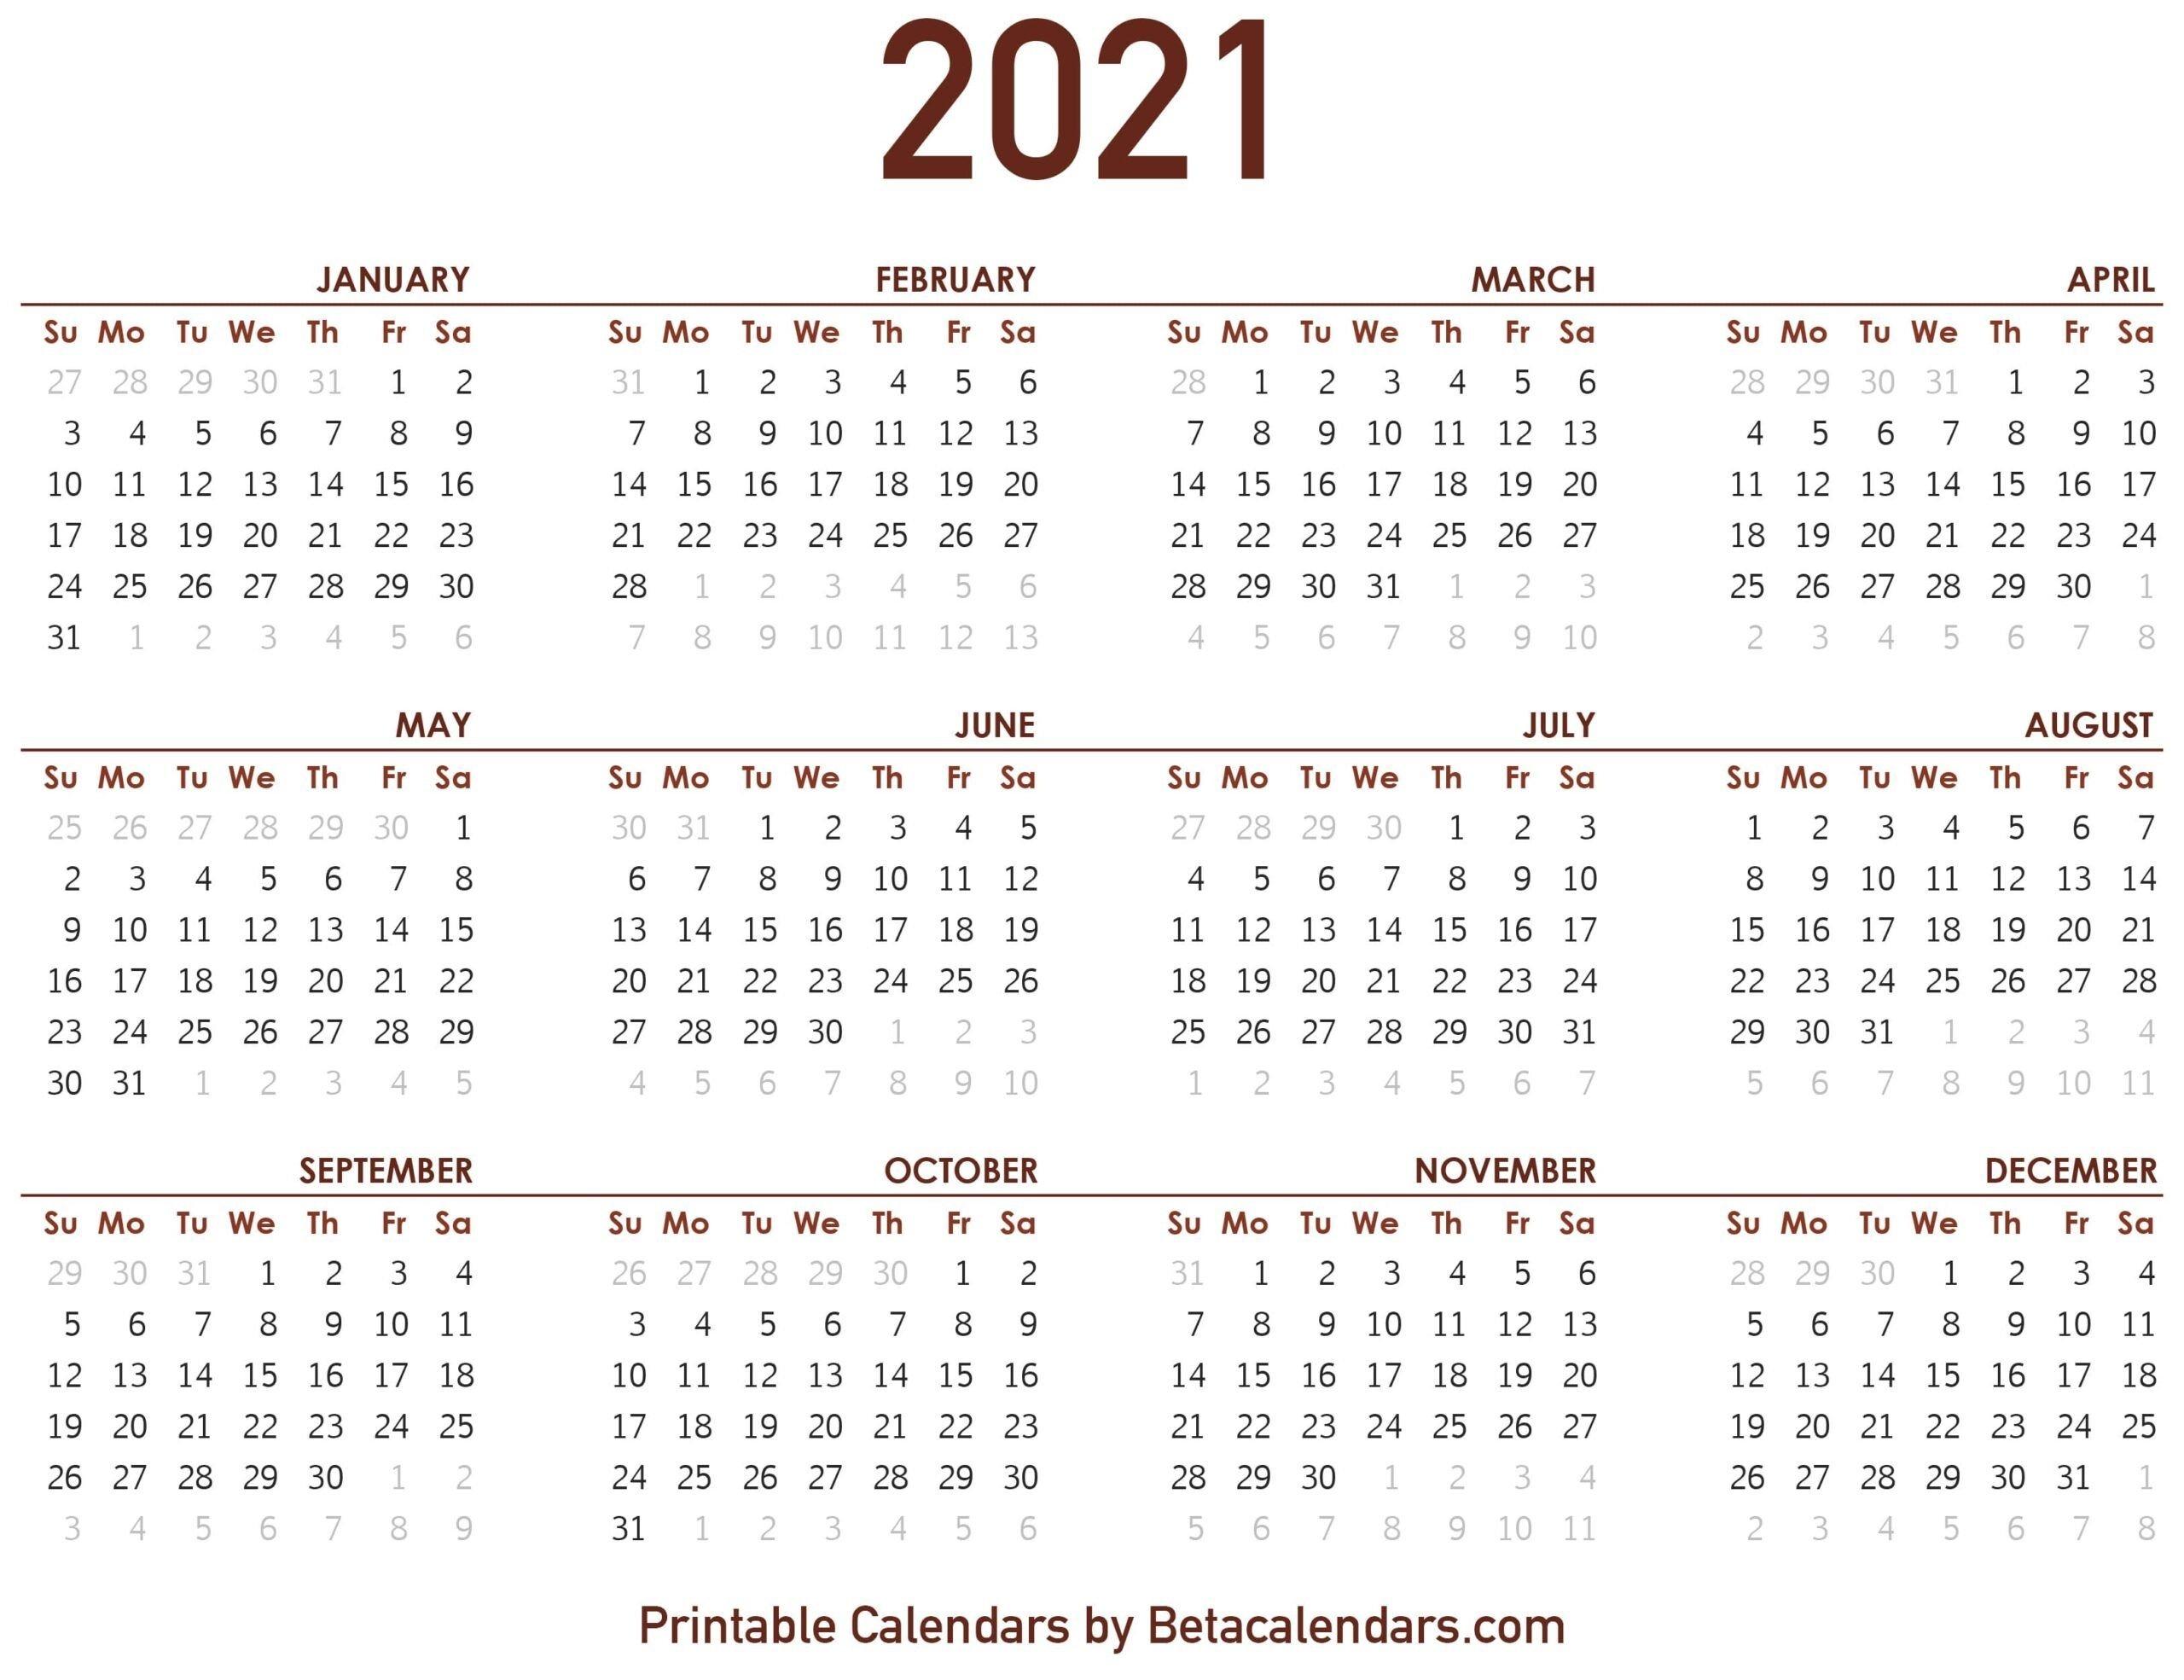 2021 Calendar With Numbered Days - Example Calendar Printable Calendar With Number Days 365